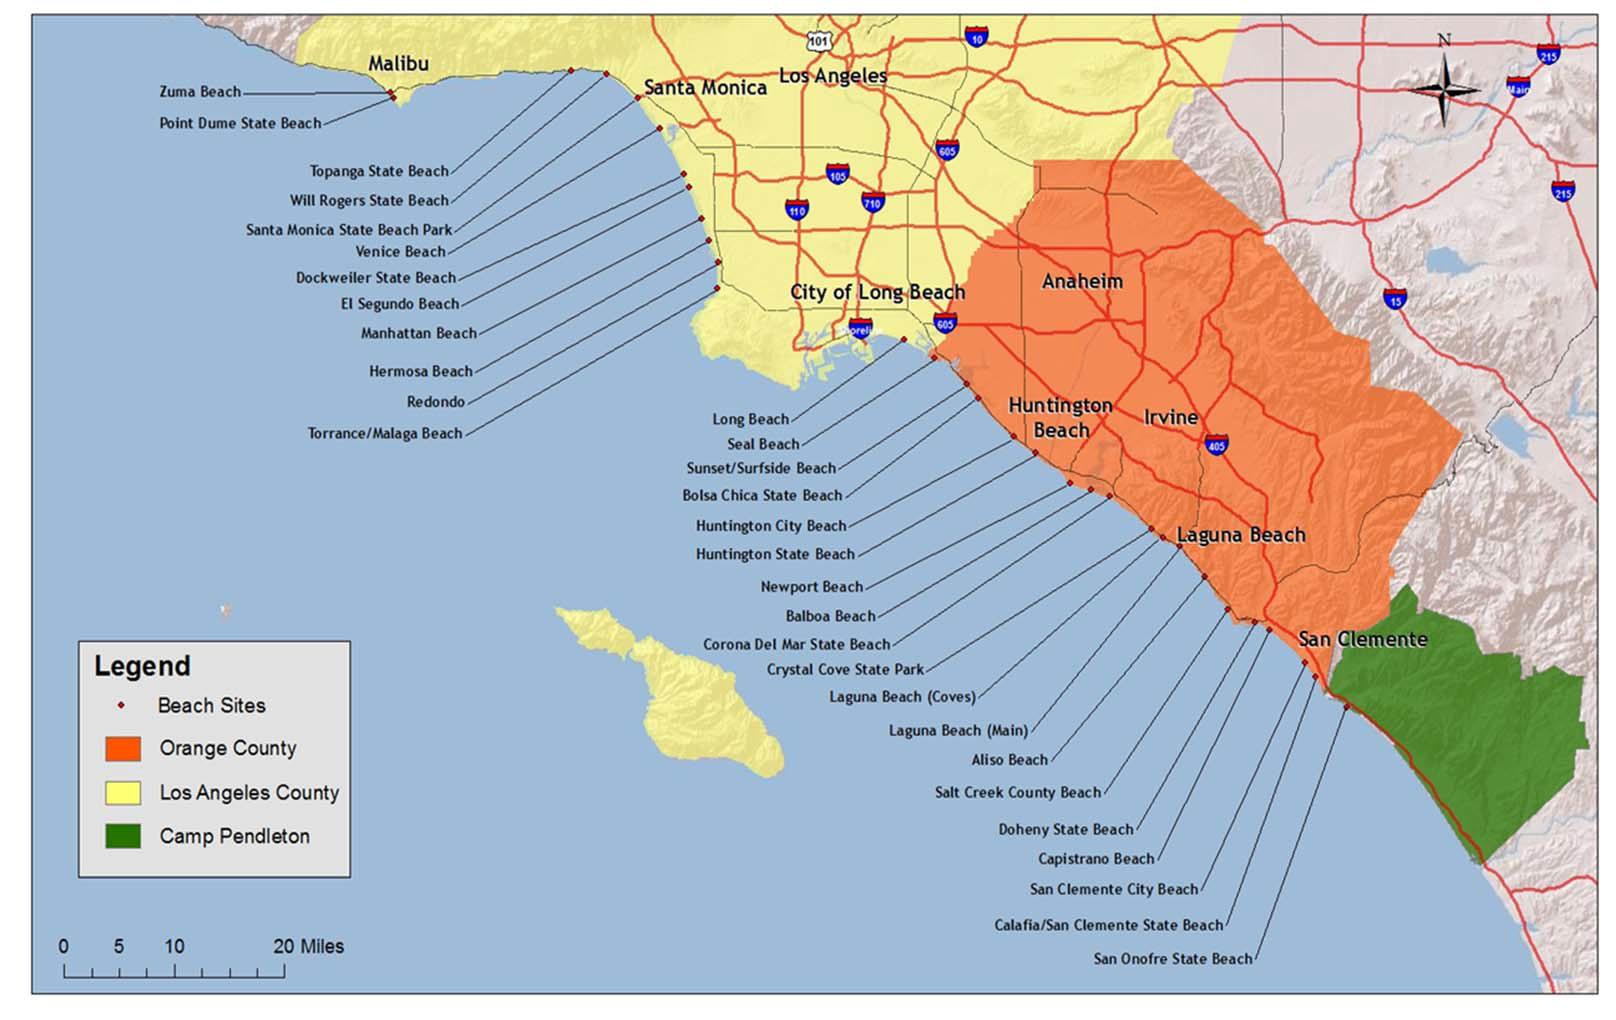 Where Is Del Mar California On The Map - Klipy - Del Mar California Map